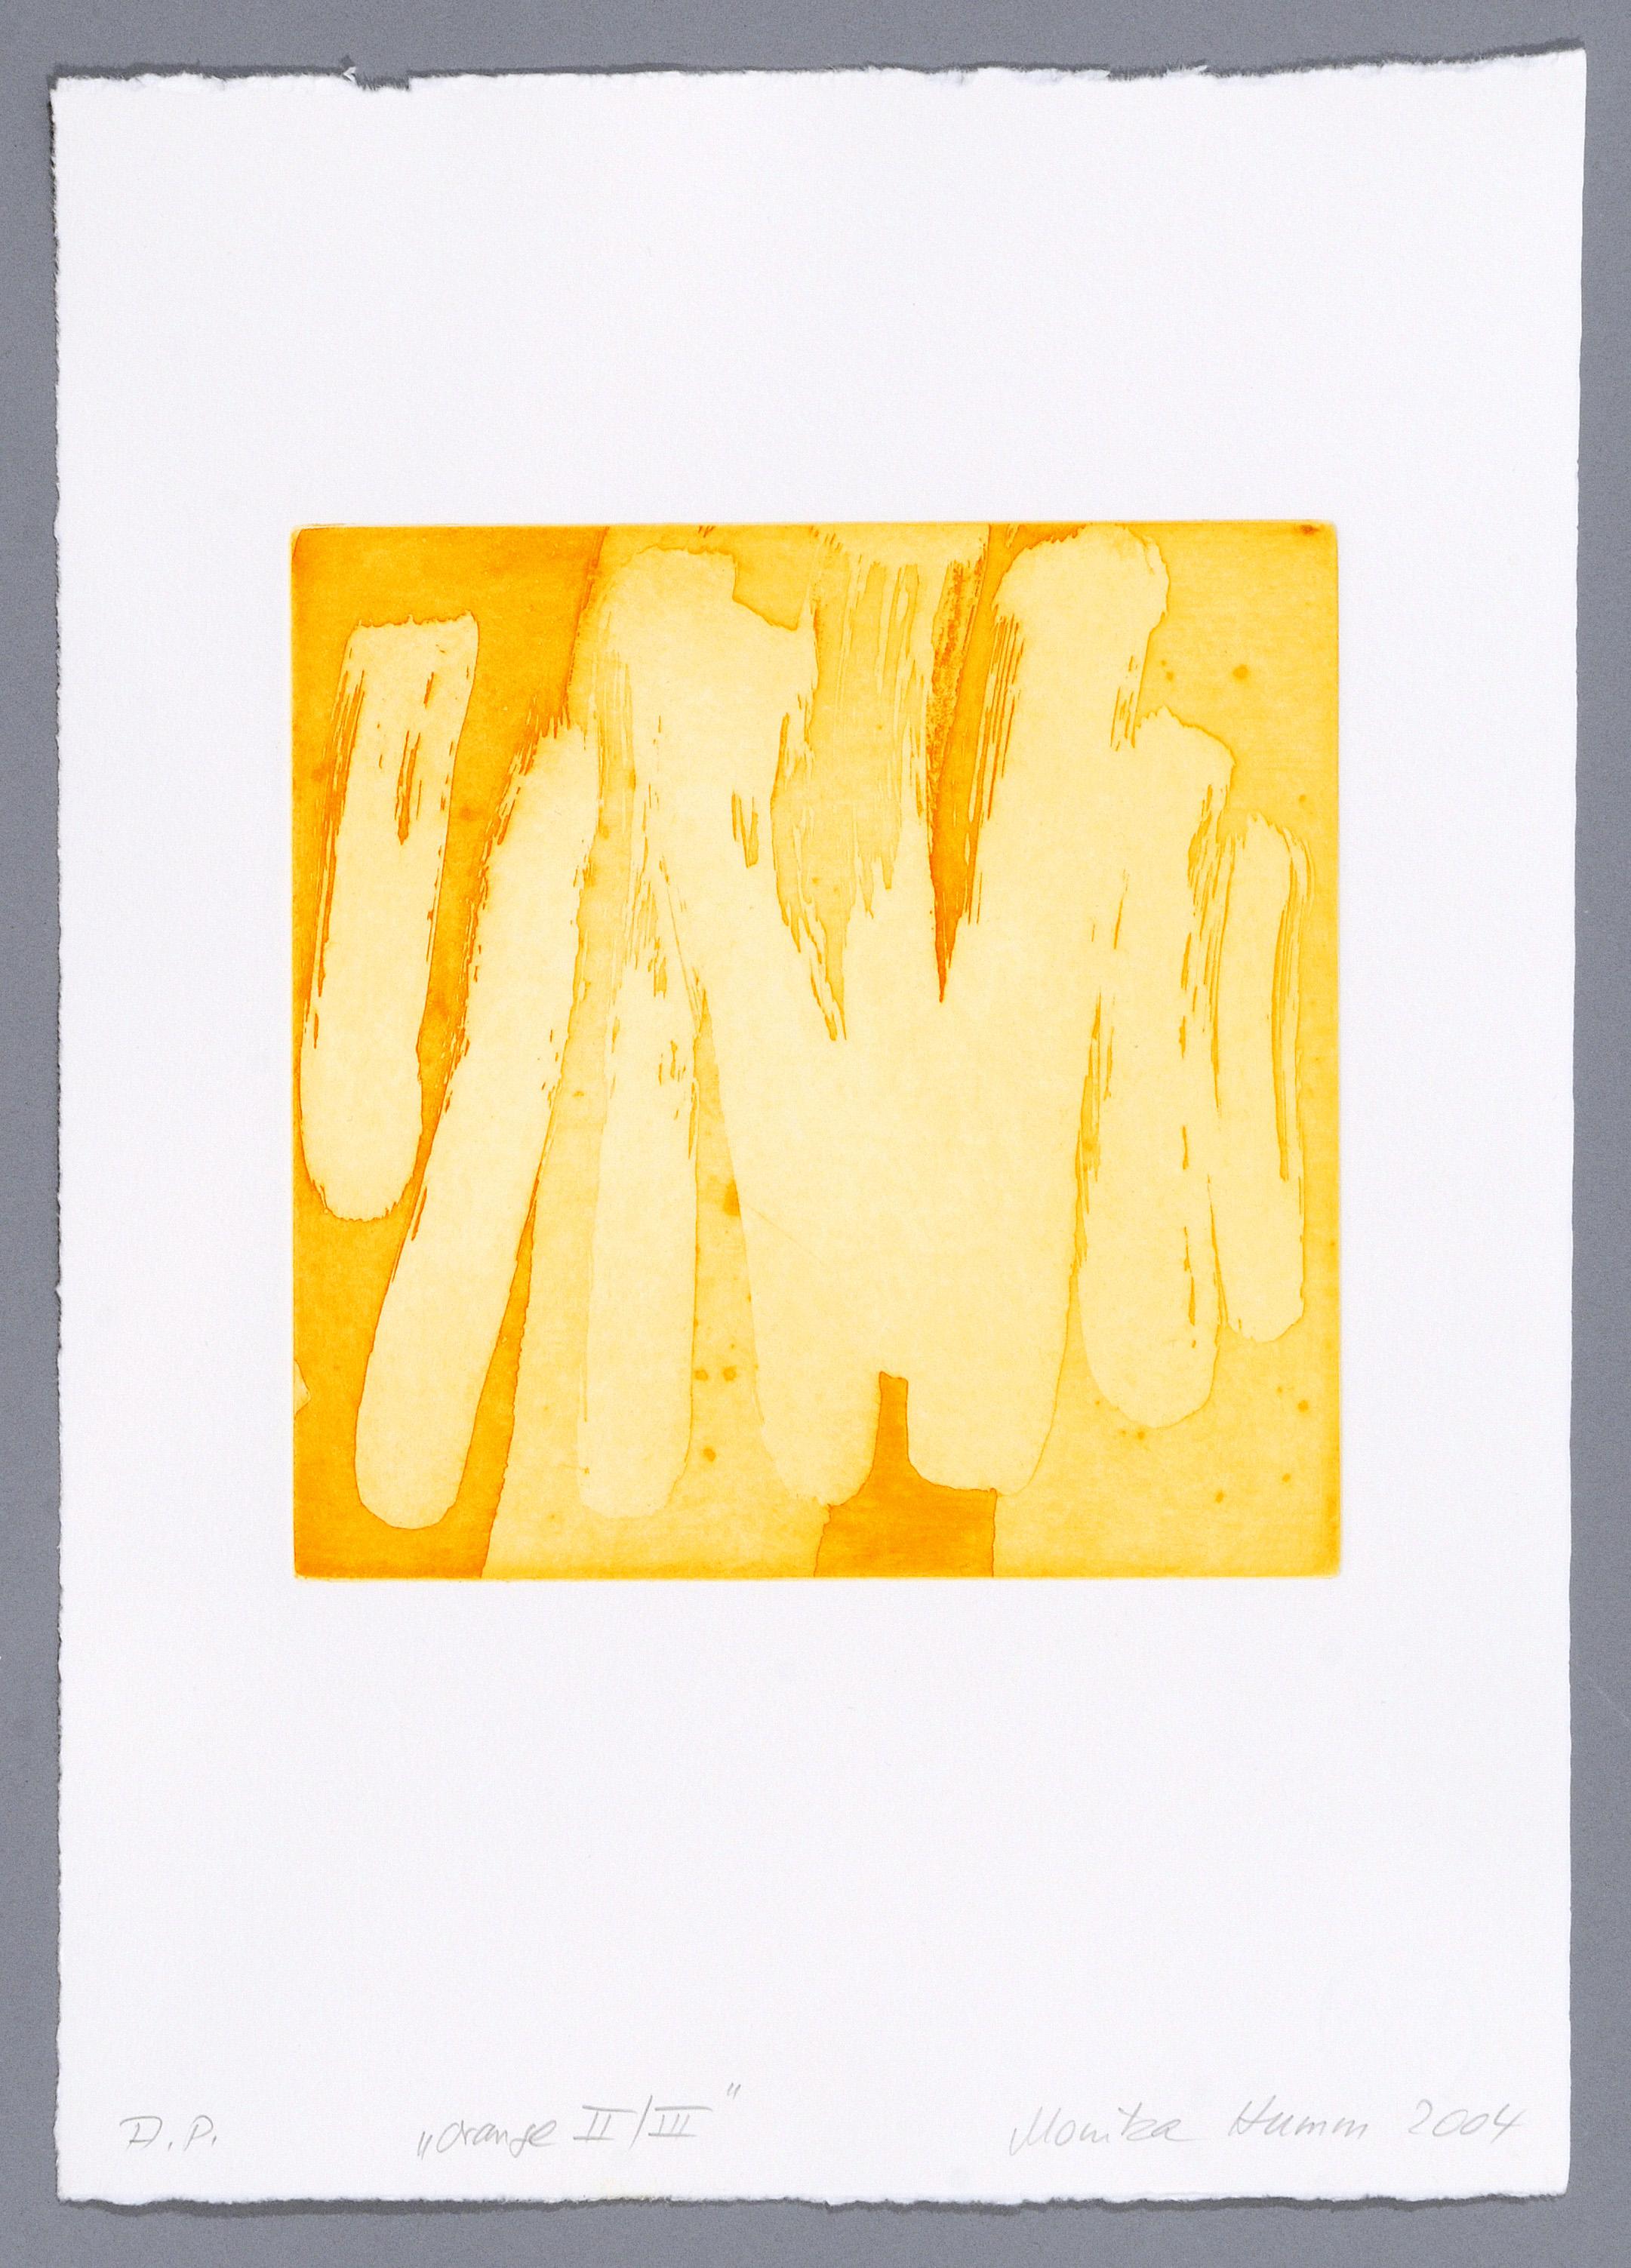 Humm_Aquatinta_V_yellow_ochre_II_39,5x28,5cm.jpg